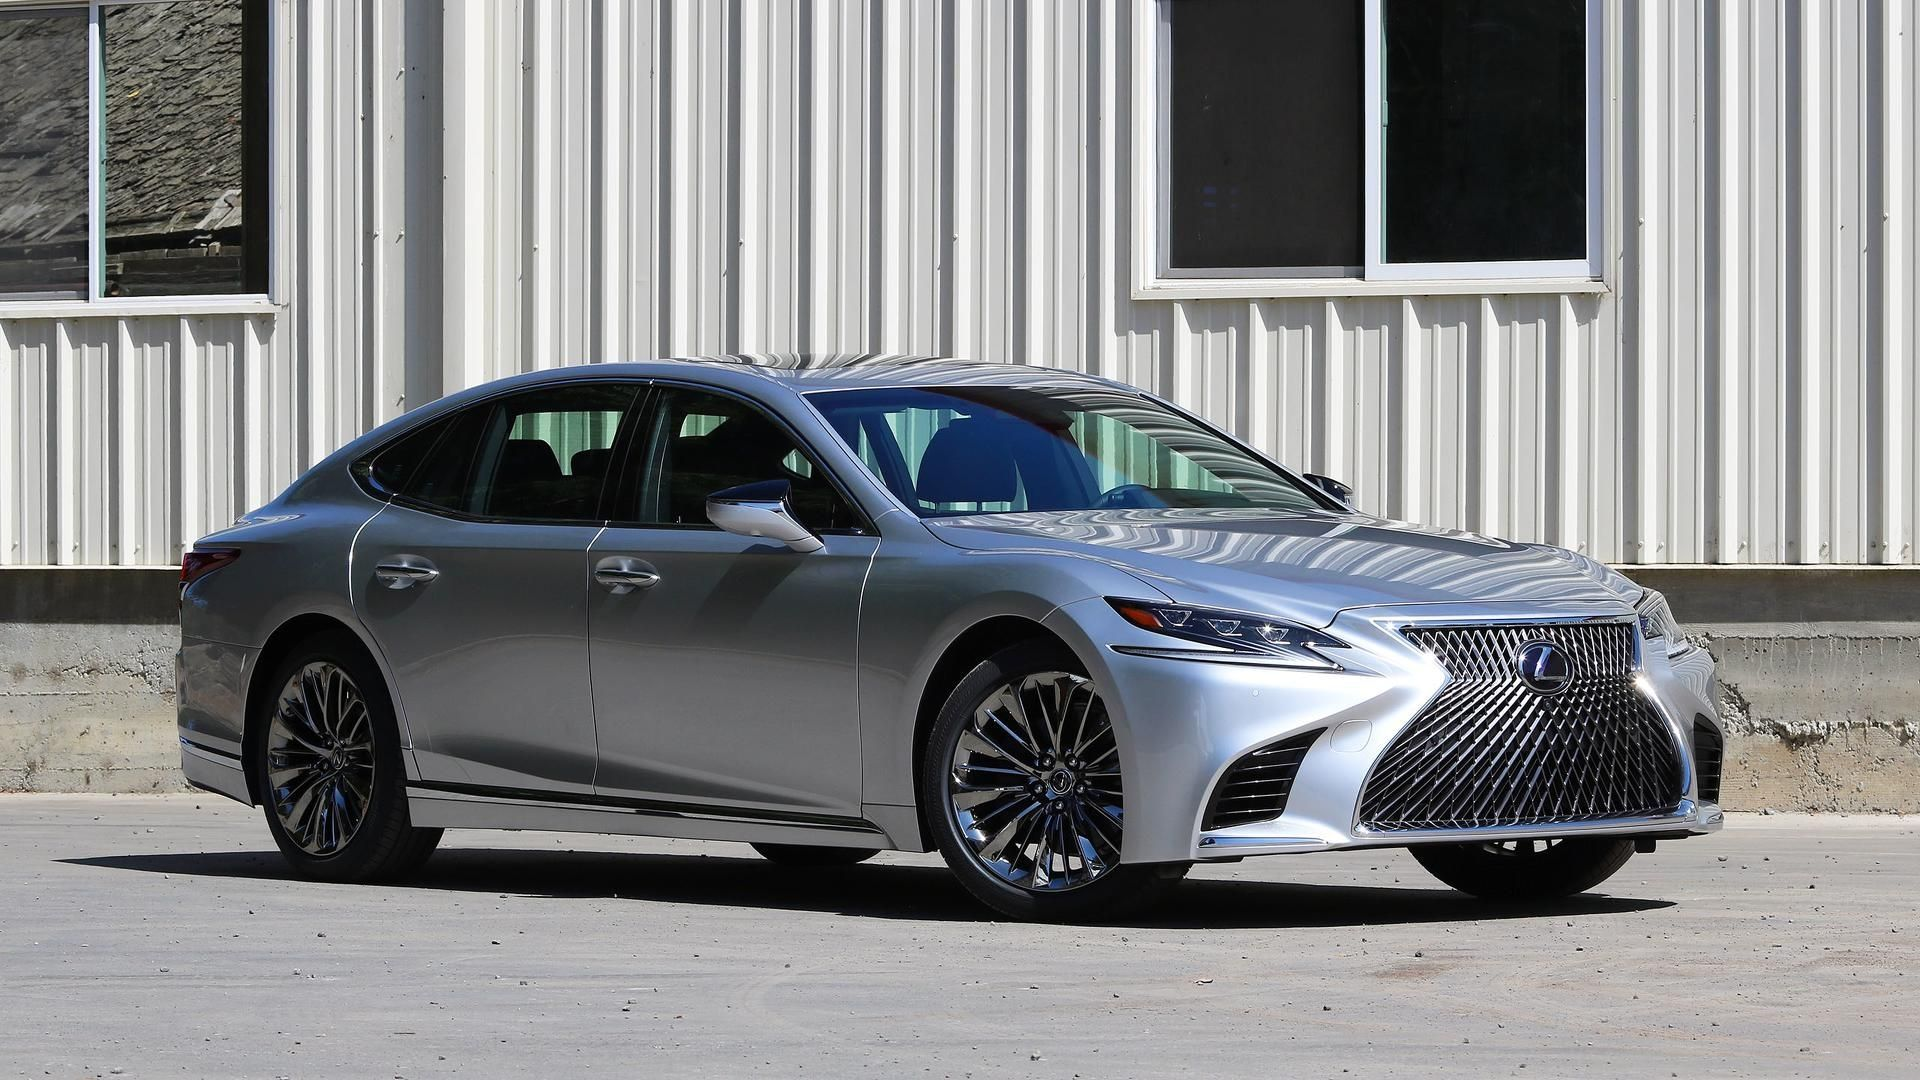 The 2020 Lexus Ls 500 Specs And Review Lexus Ls Lexus Cars Lexus Ls 460